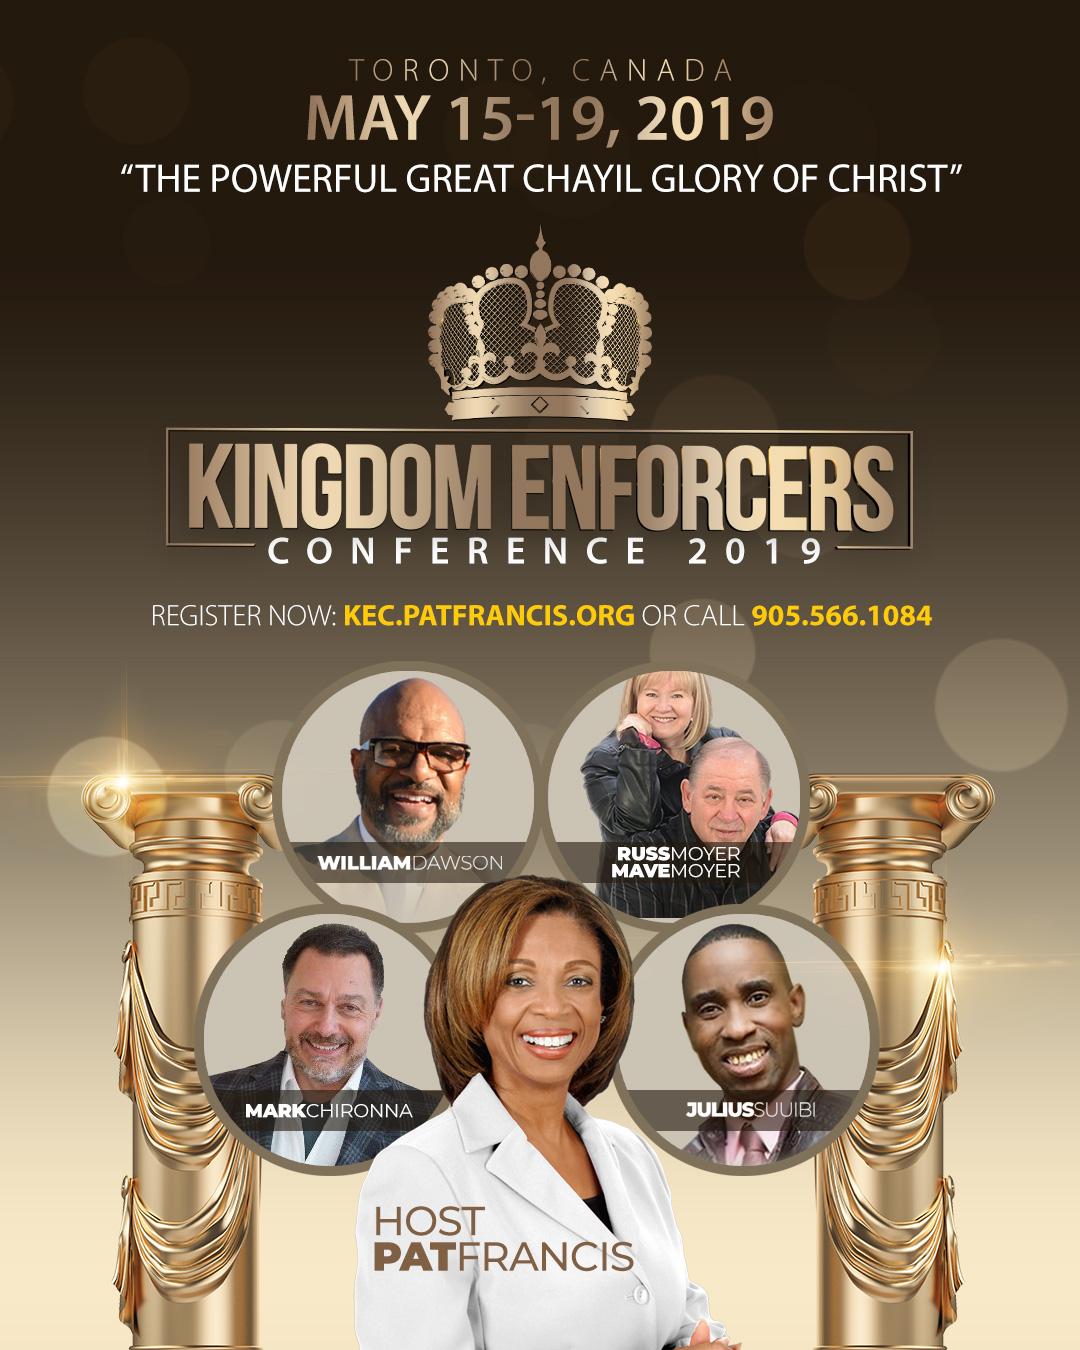 CHAYIL GLORY - KINGDOM ENFORCERS CONFERENCE 2019